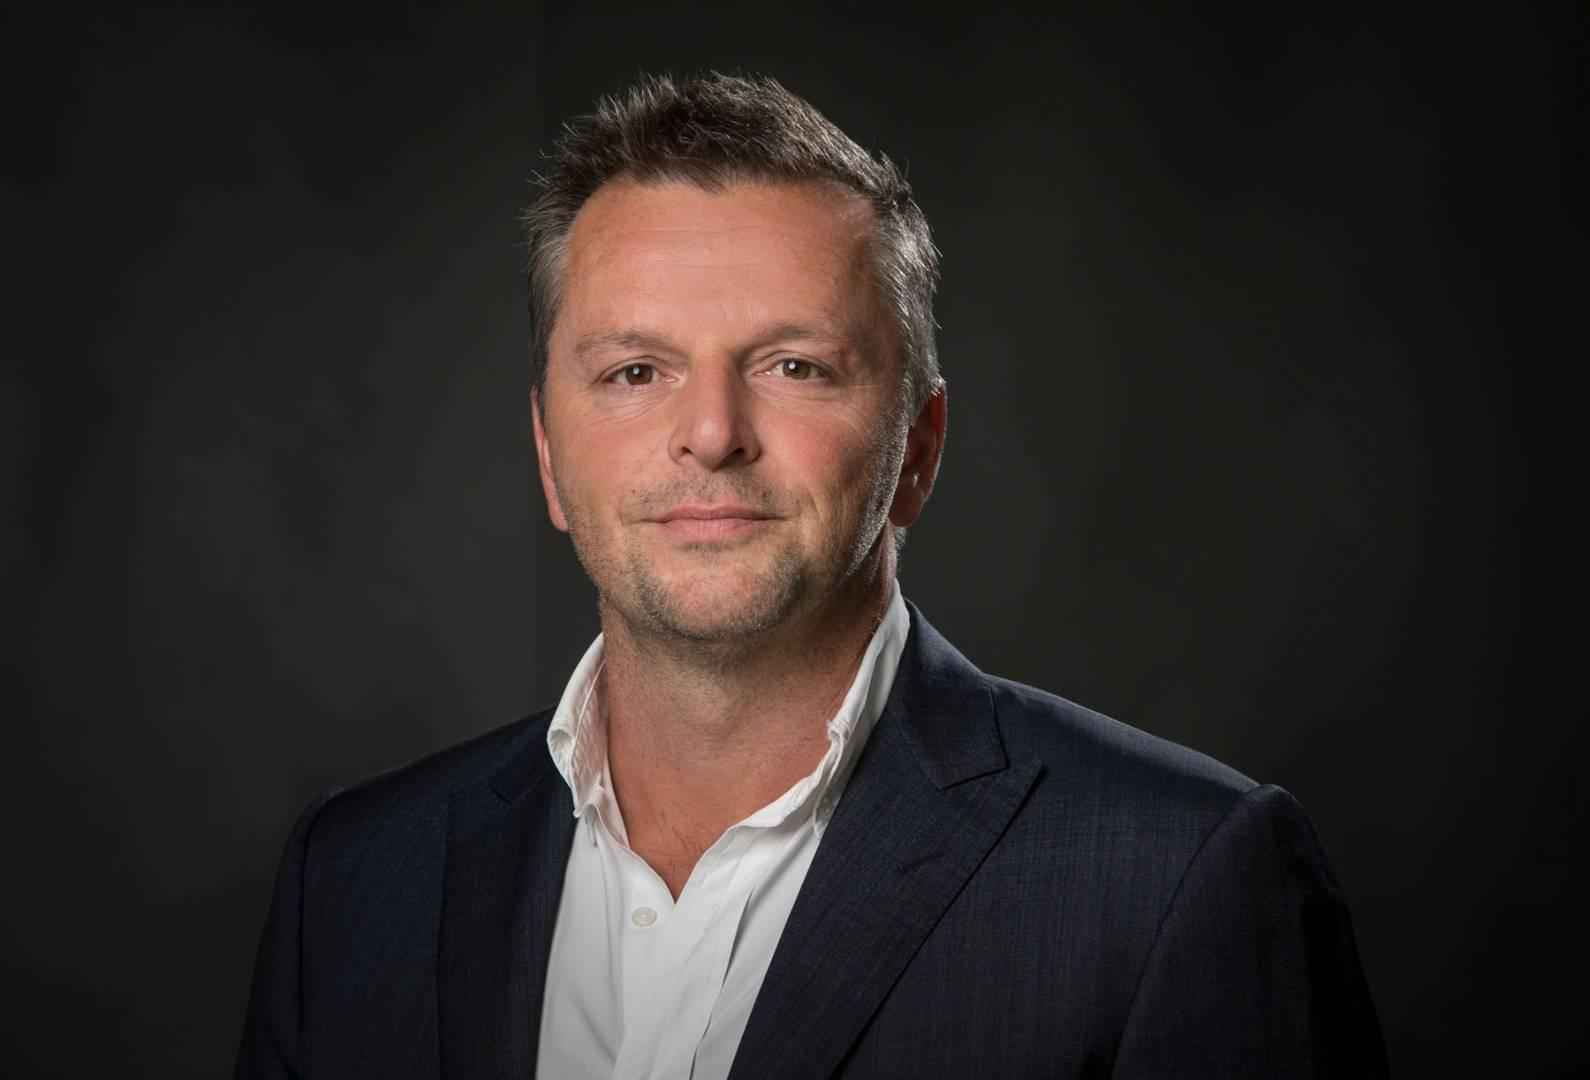 René Boerhoop